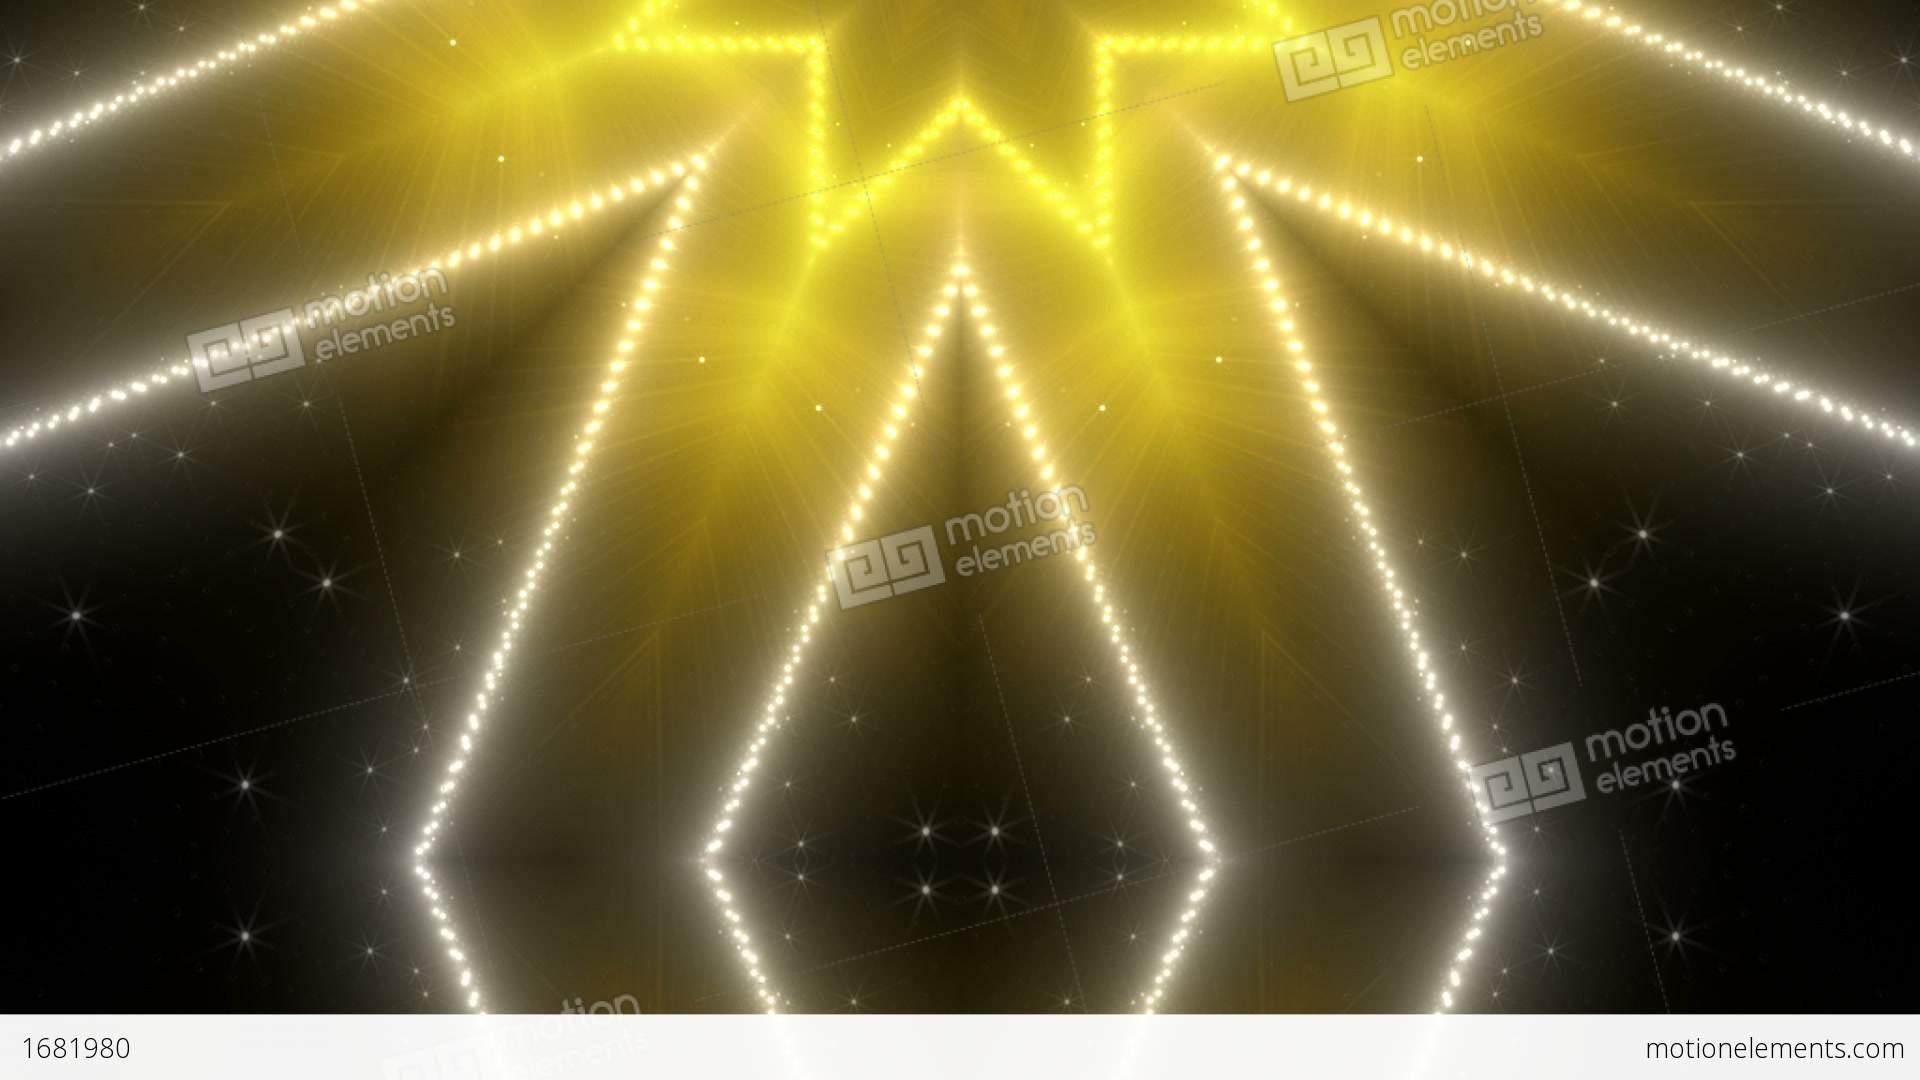 LED Kaleidoscope Wall 2 W Ds O 4g HD Stock Animation | 1681980